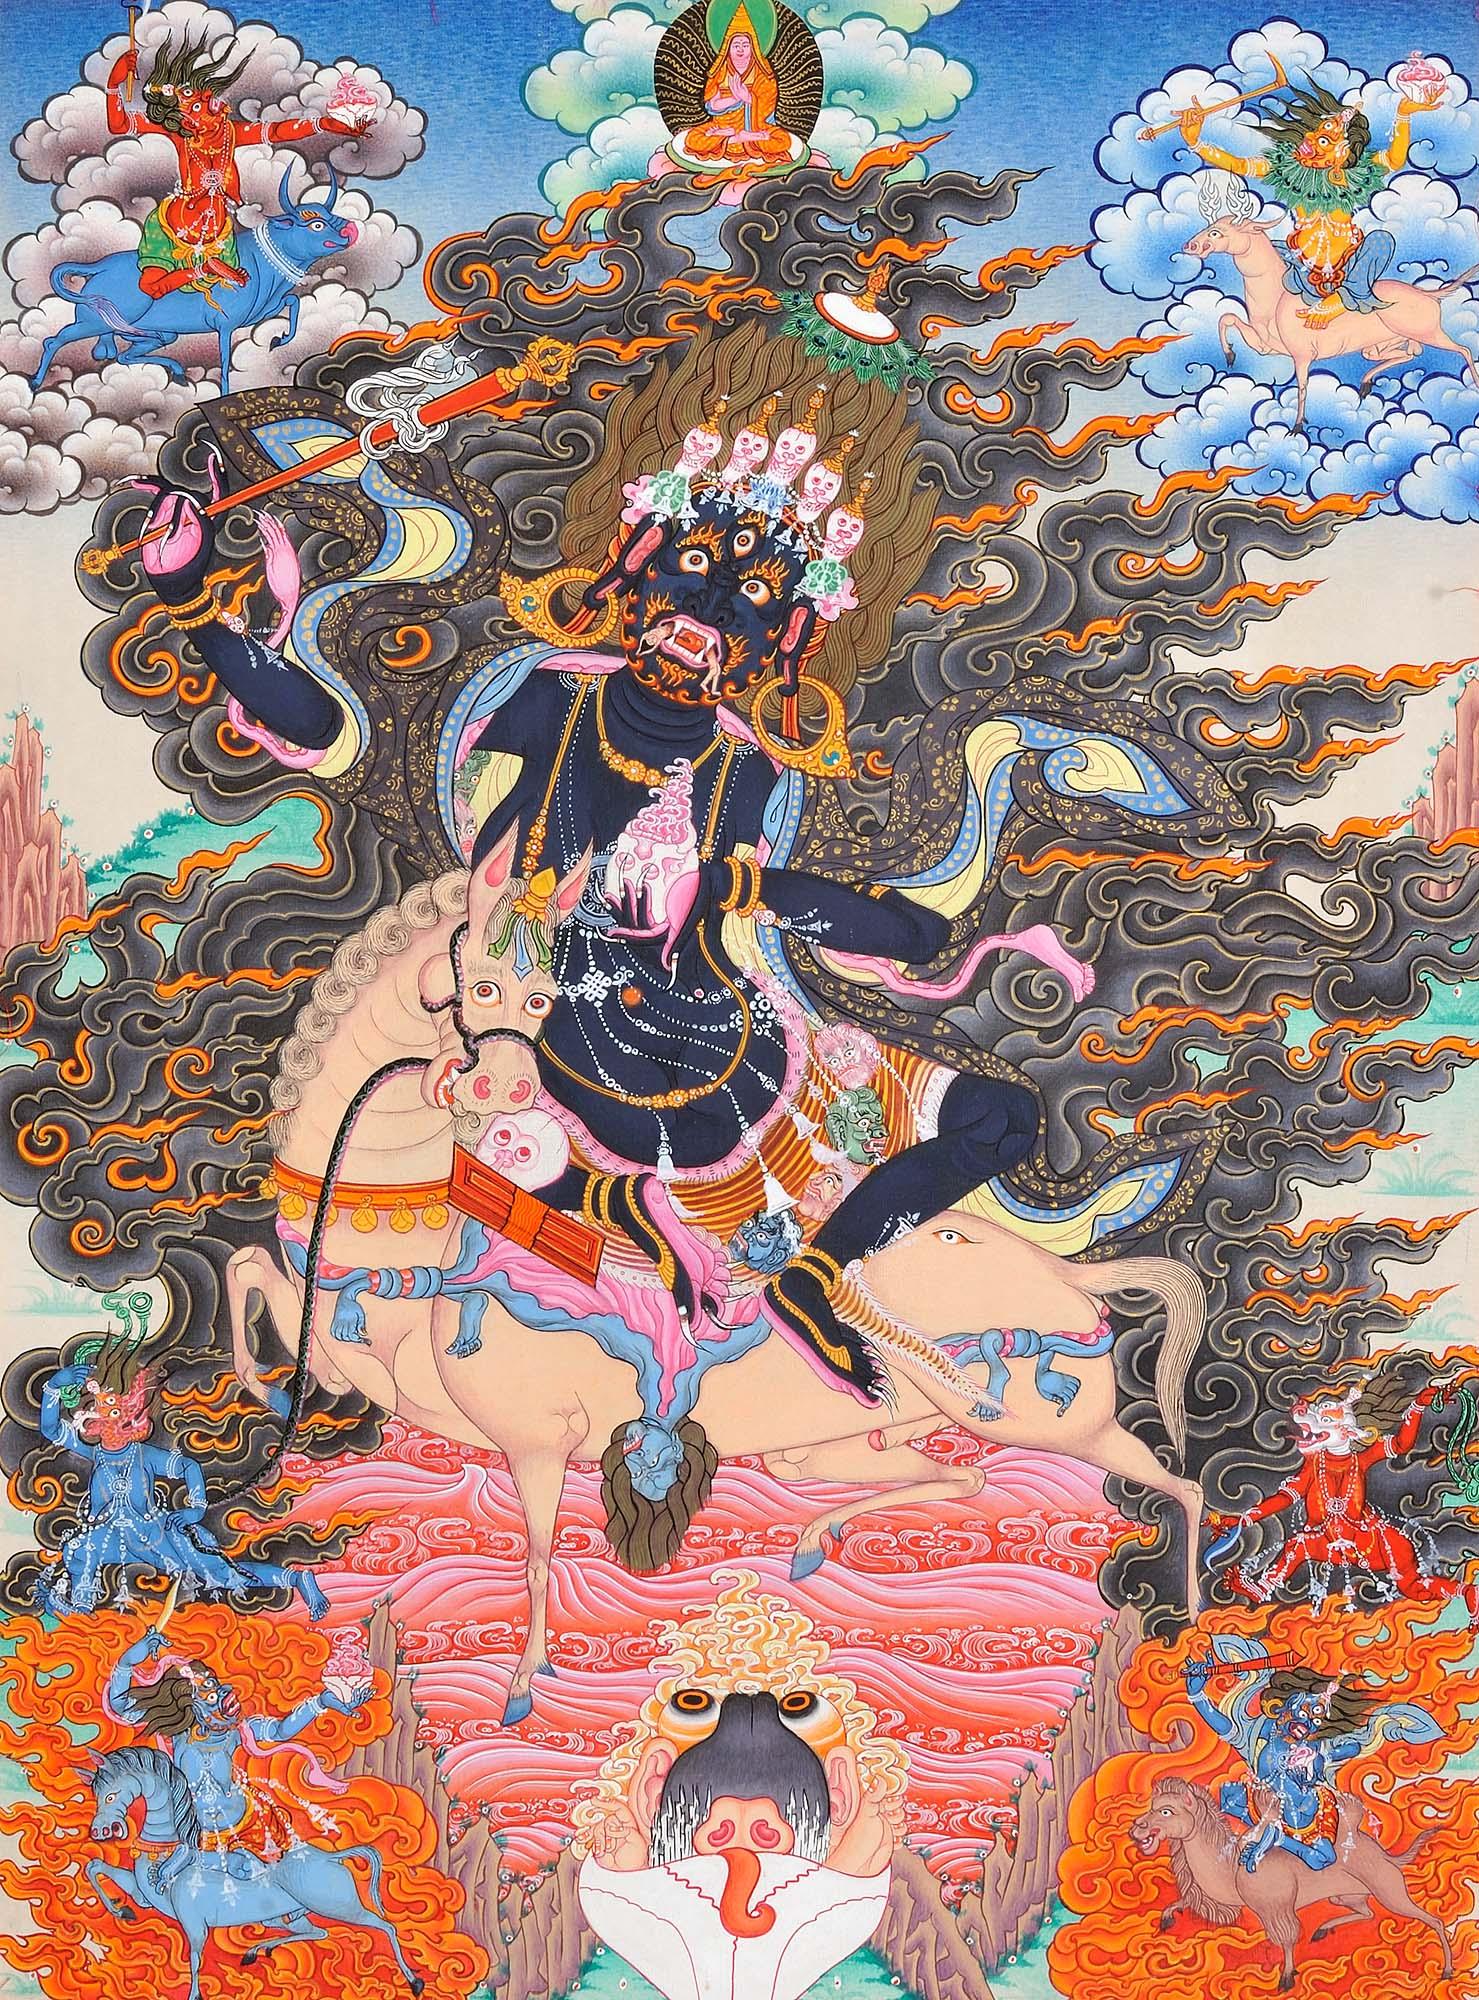 Tibetan Buddhist Goddess Palden Lhamo - Who Rides on a Sea of Blood  (Protector of the Dalai Lama)